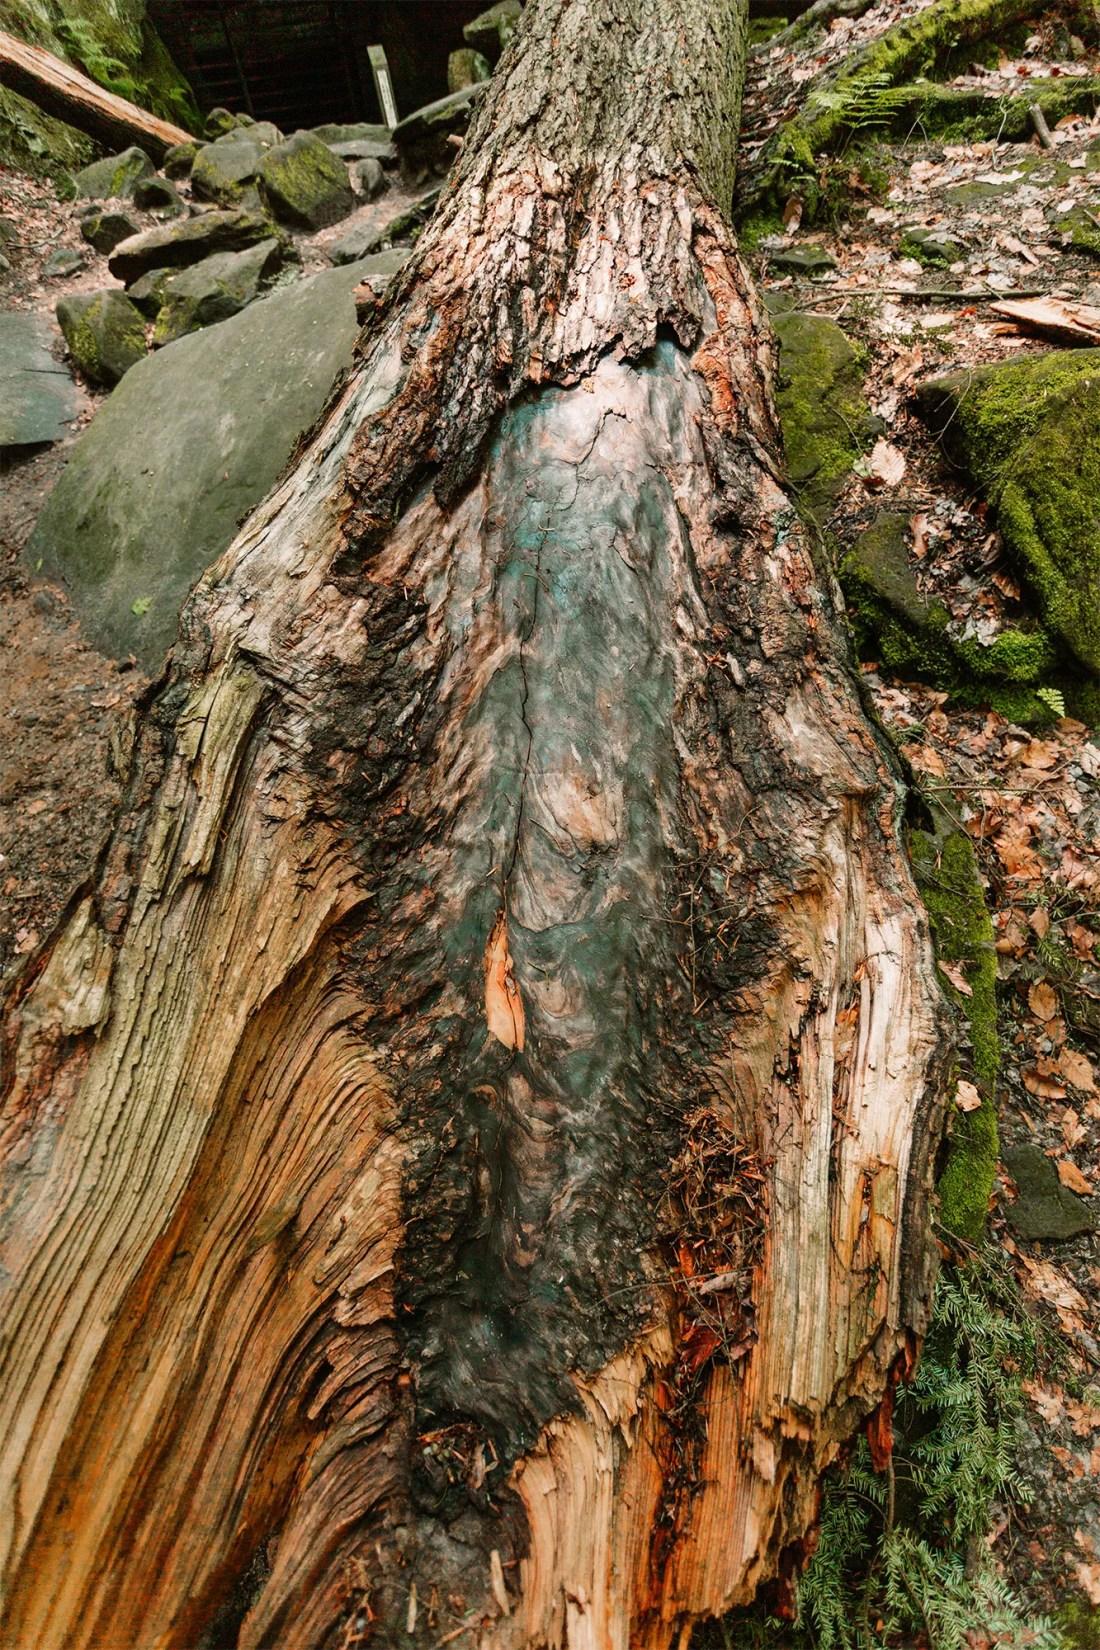 Burnt tree trunk